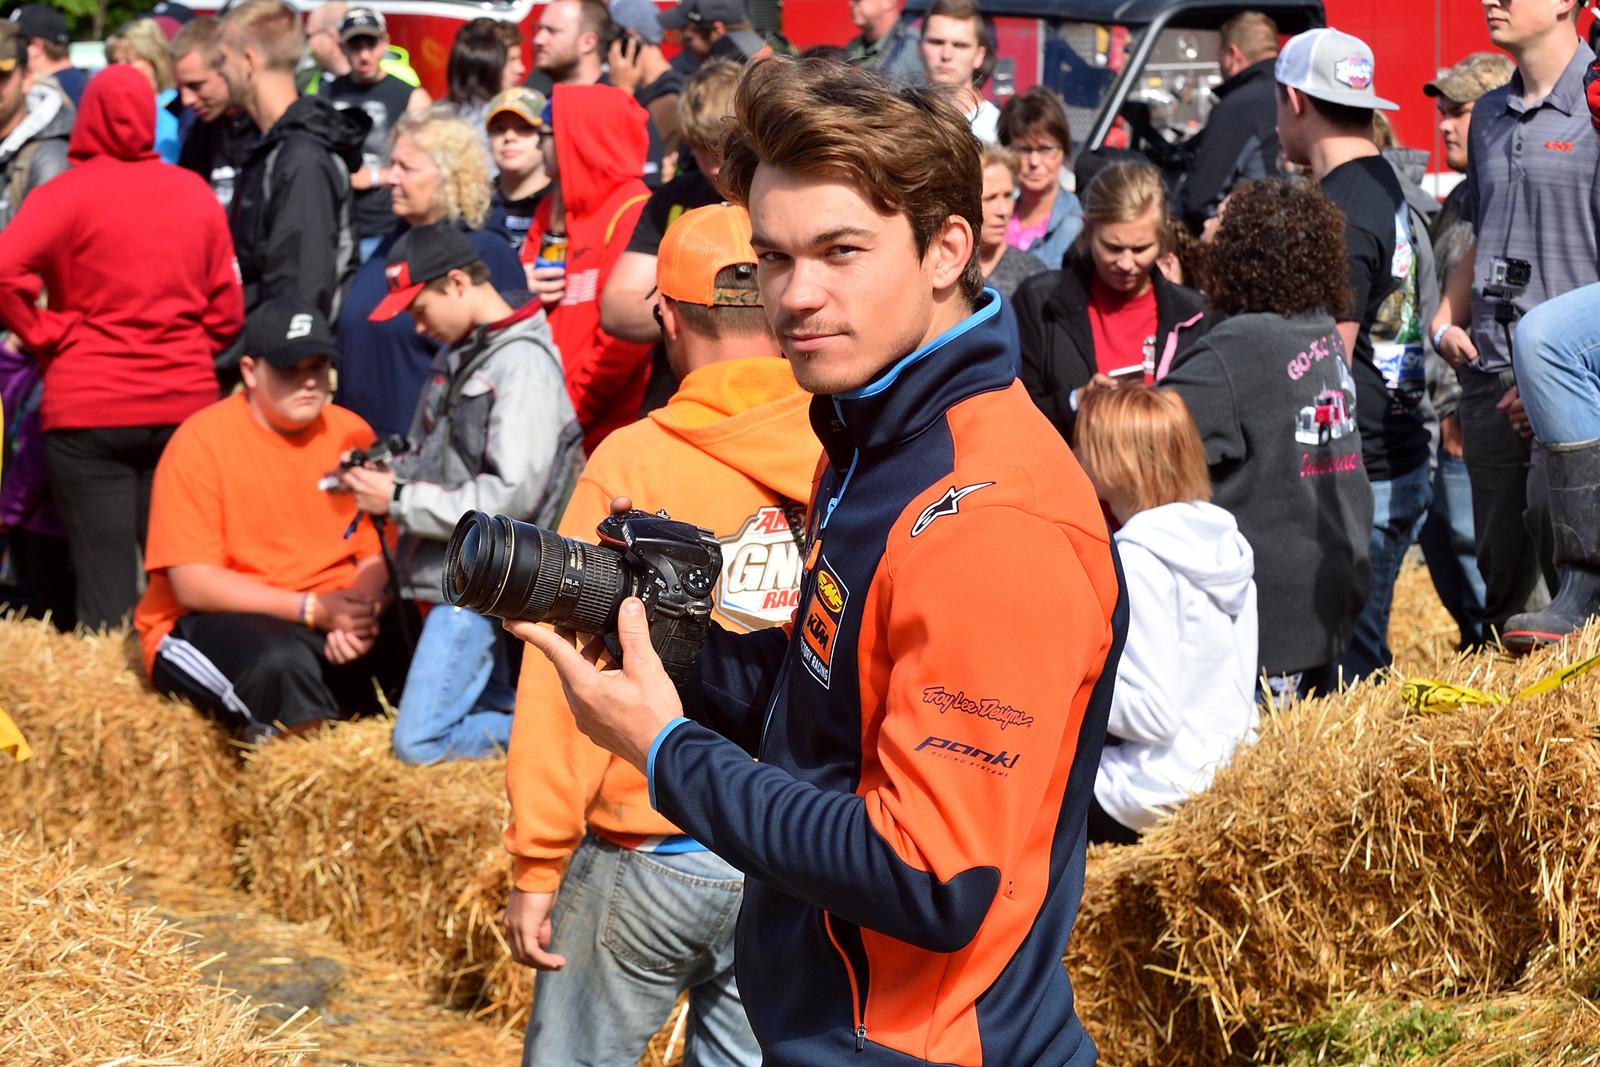 Snowshoe GNCC Photo Gallery: Kailub Russell - Snowshoe GNCC - Motocross Pictures - Vital MX